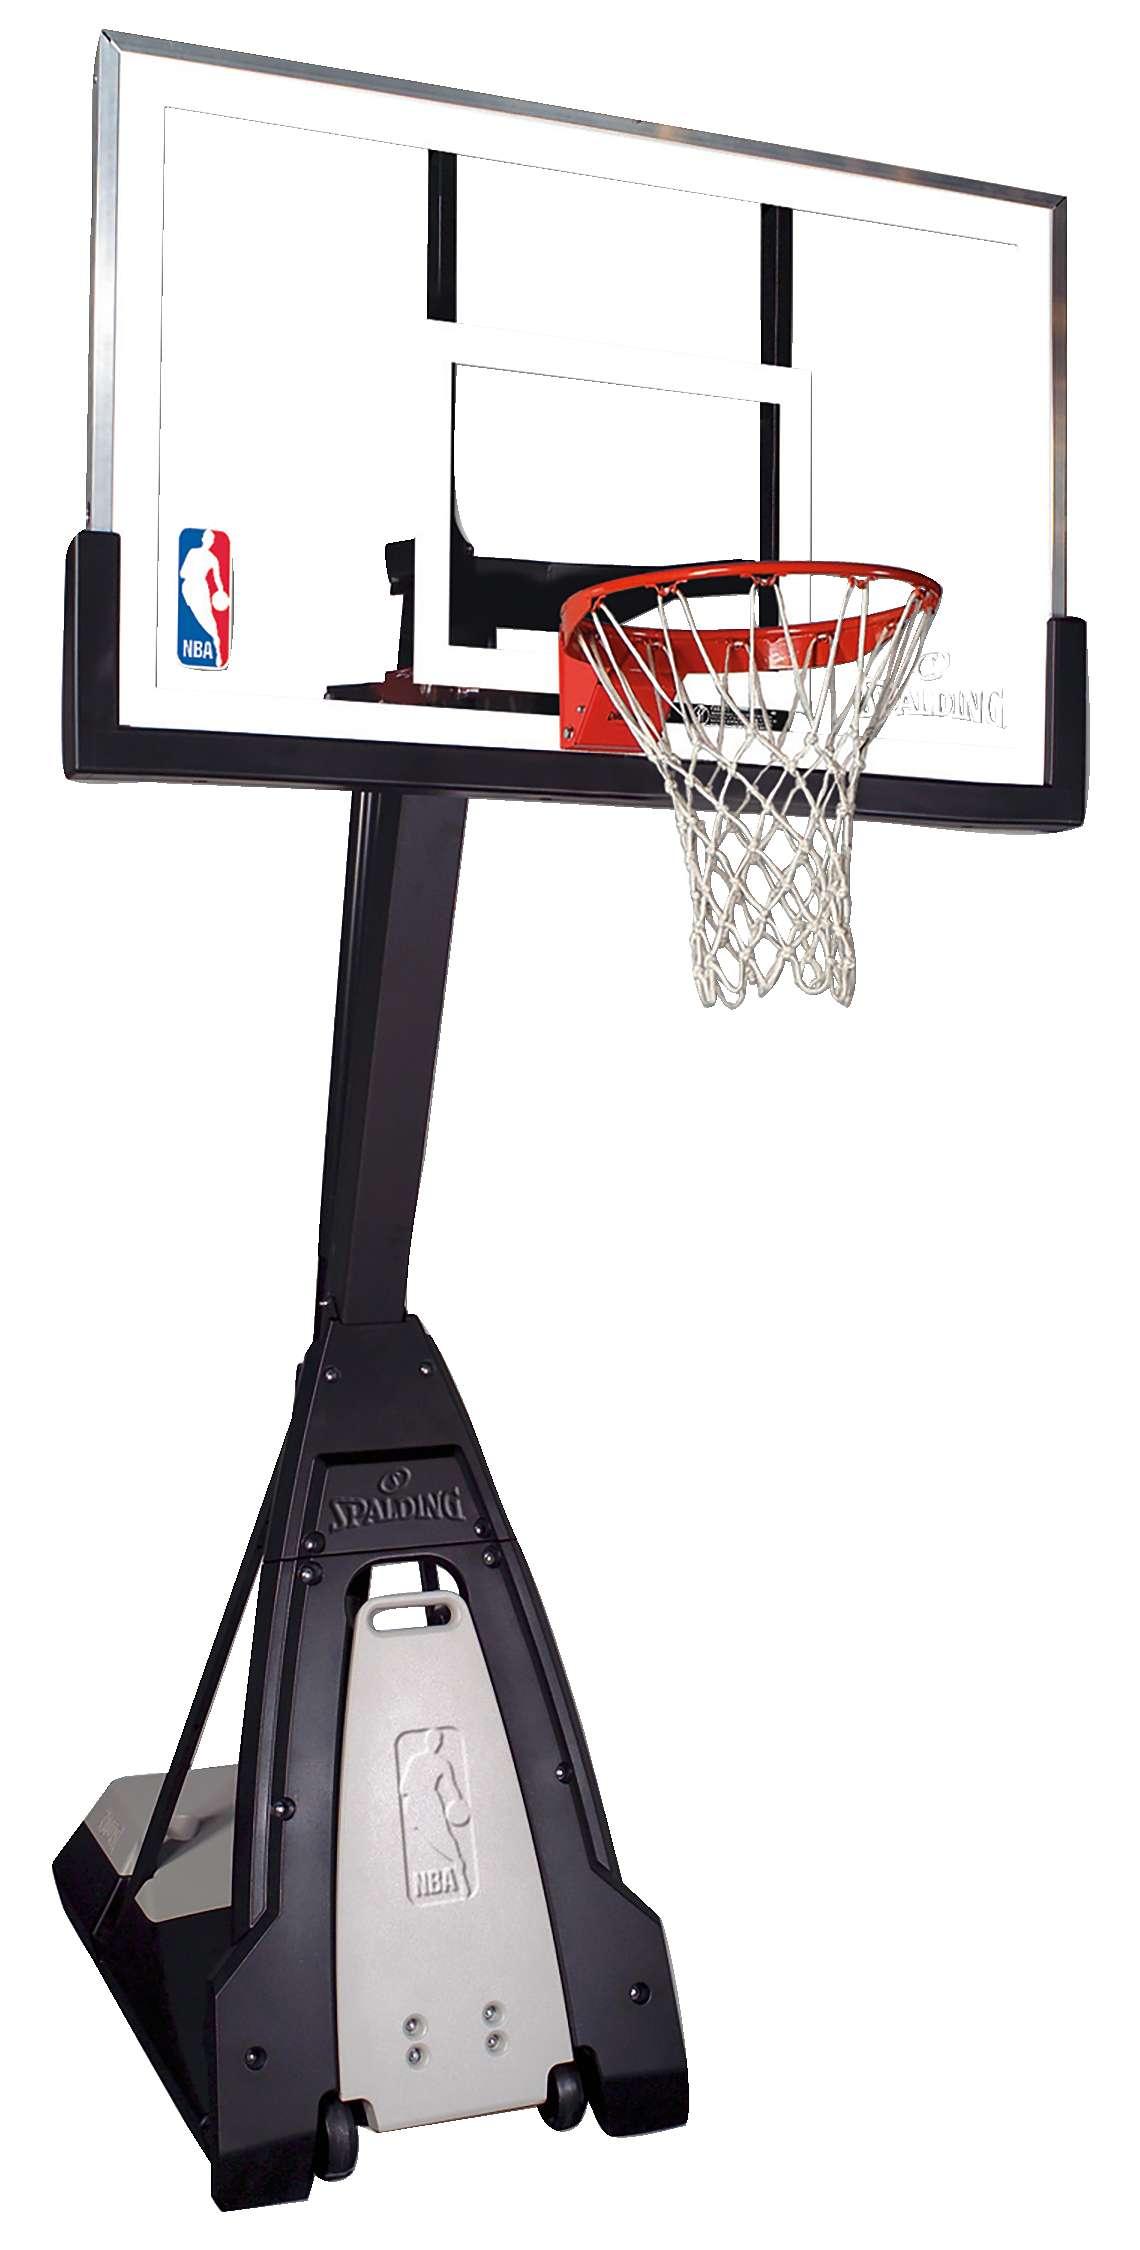 "Spalding Basketballanlage ""NBA Beast Portable"" - Teamsport - Spalding"